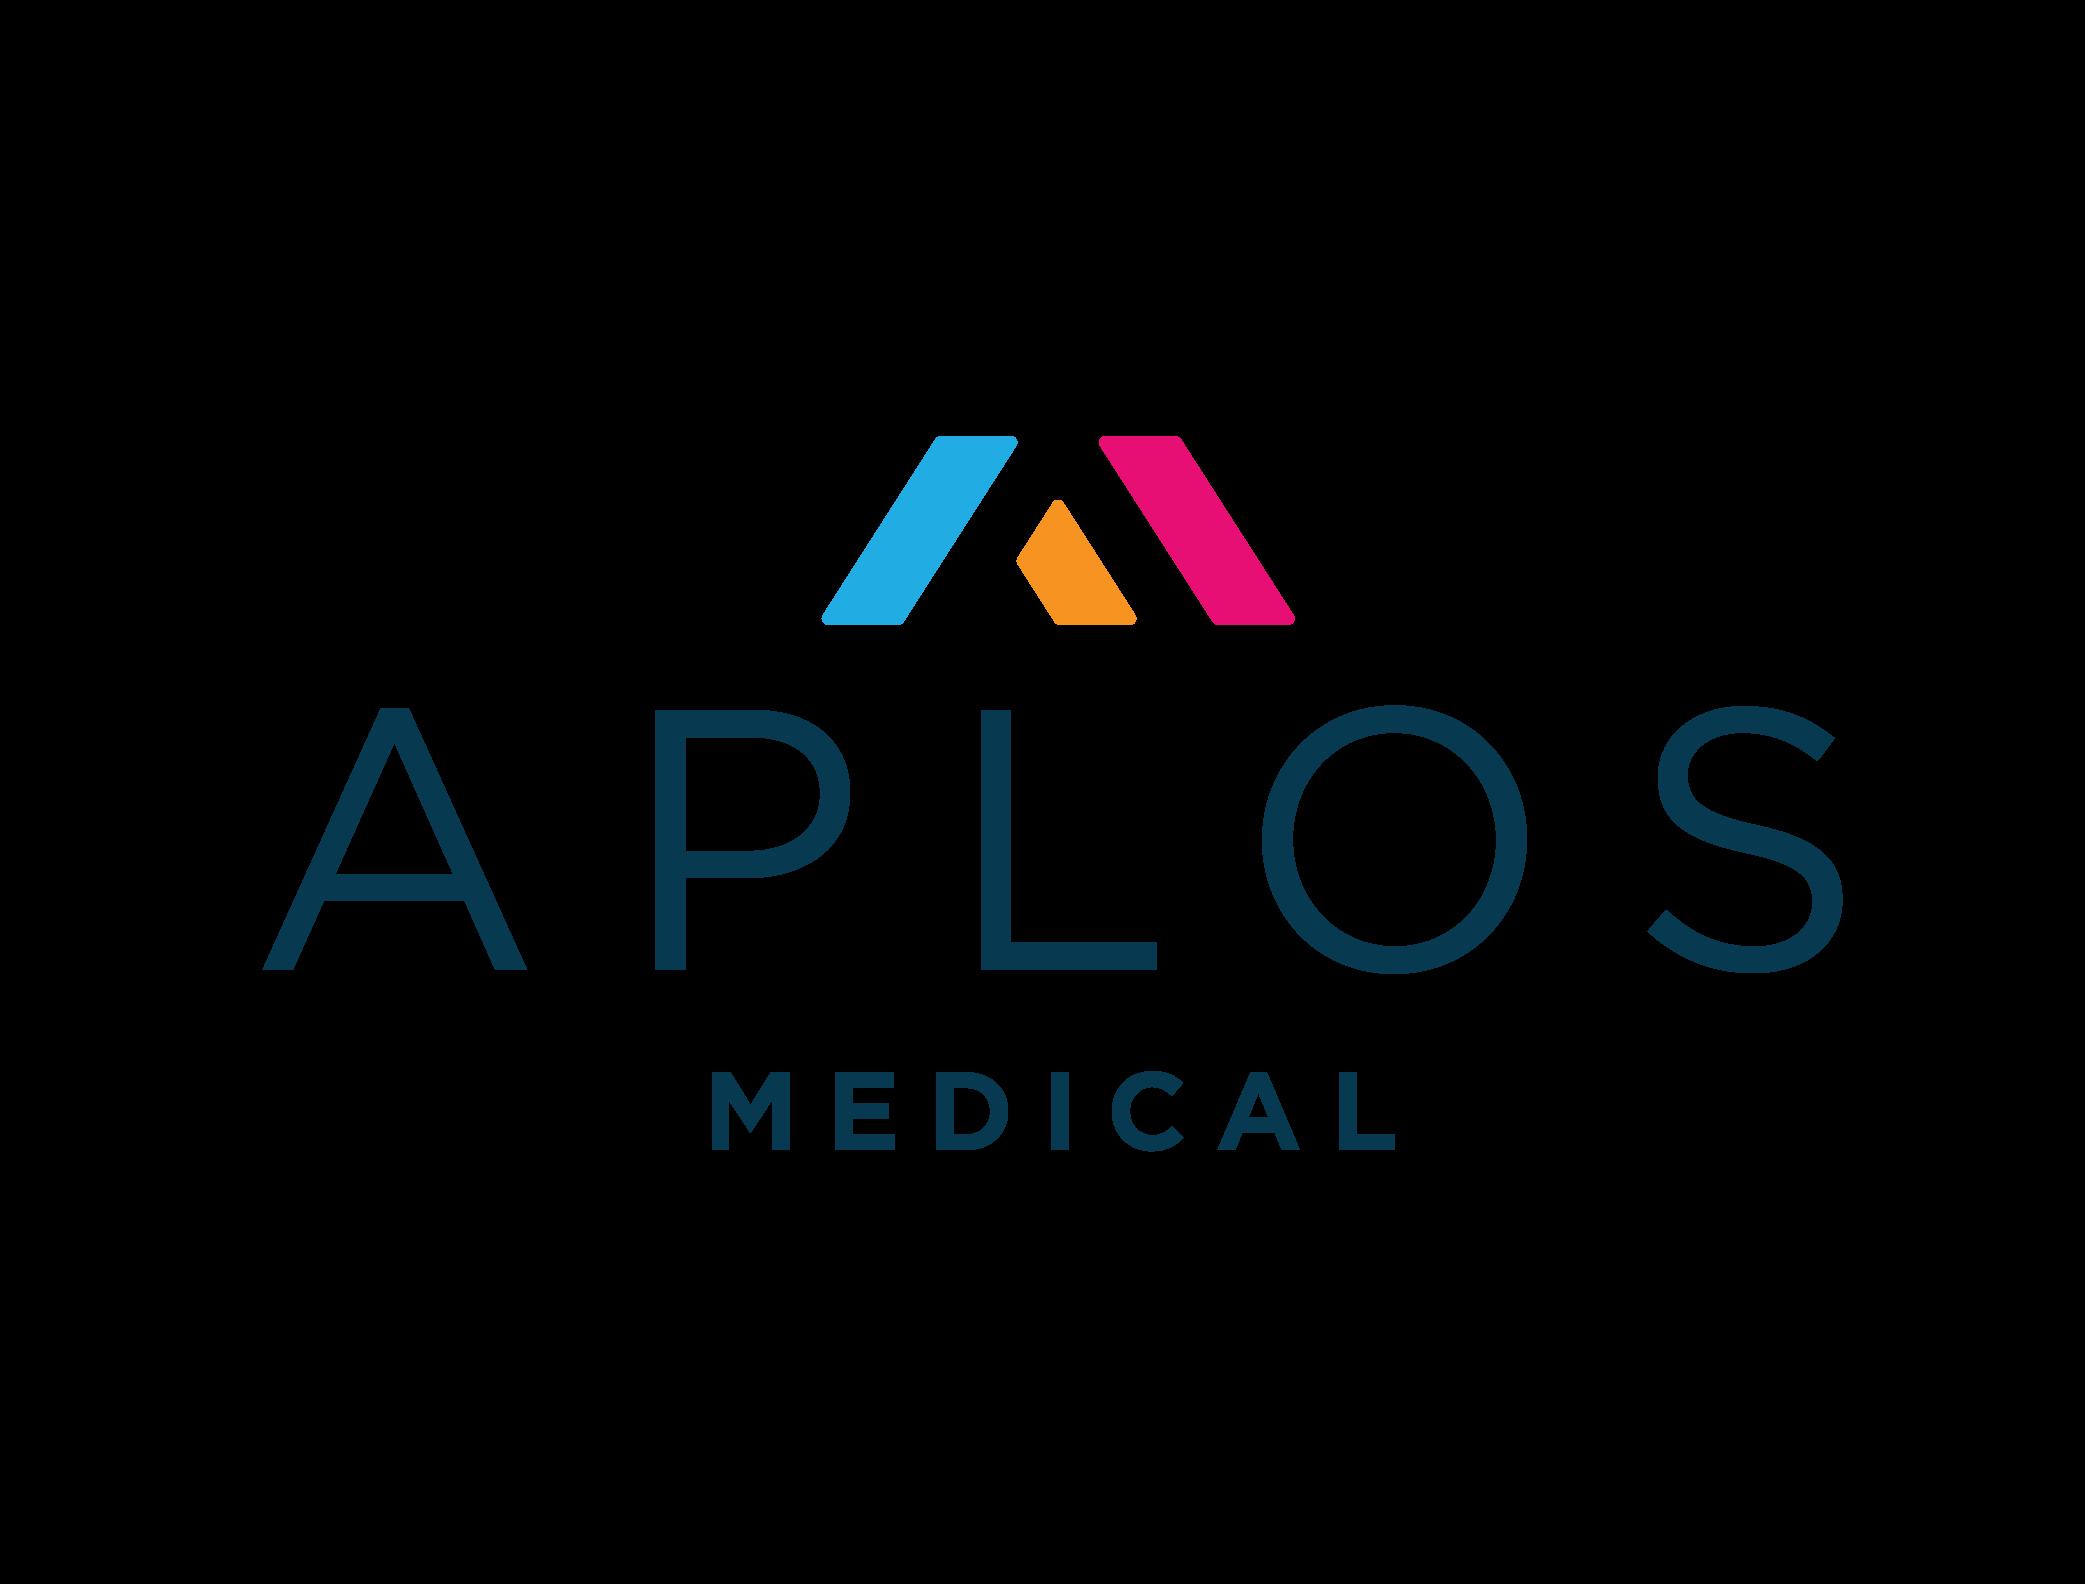 Aplos Medical